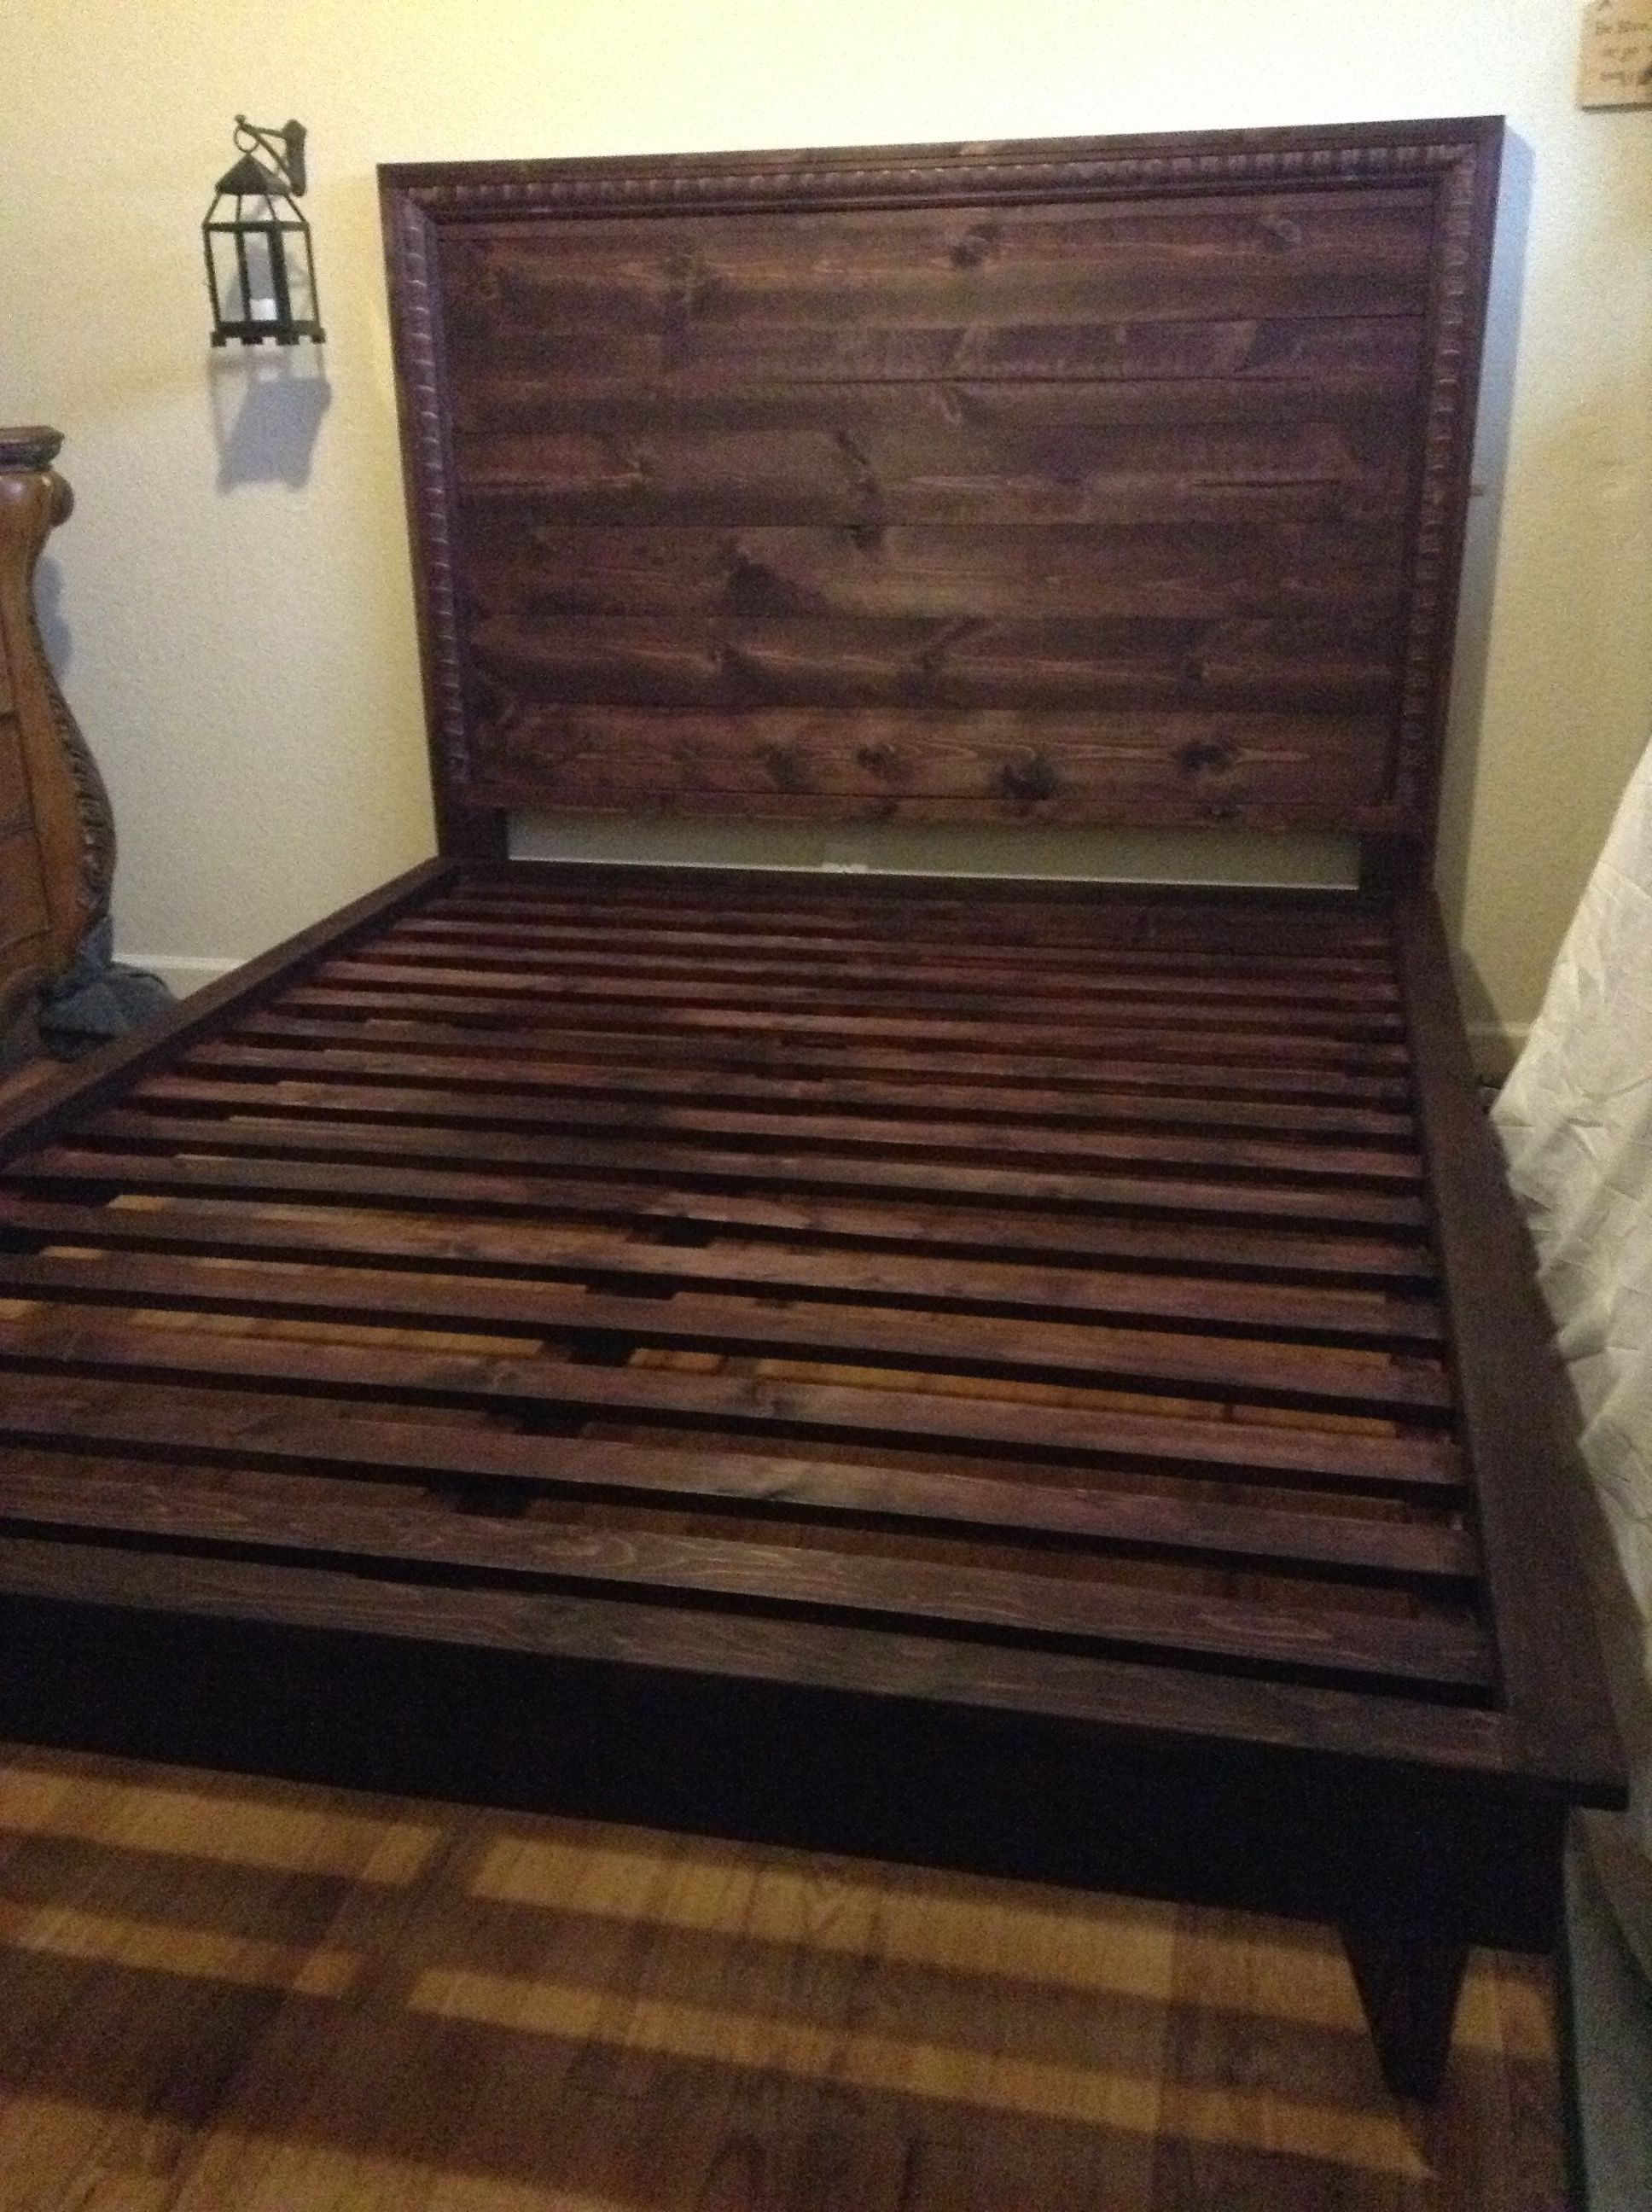 Inspirational Carpenter Made Mahogany Bed Frames With Rustic Barn ...